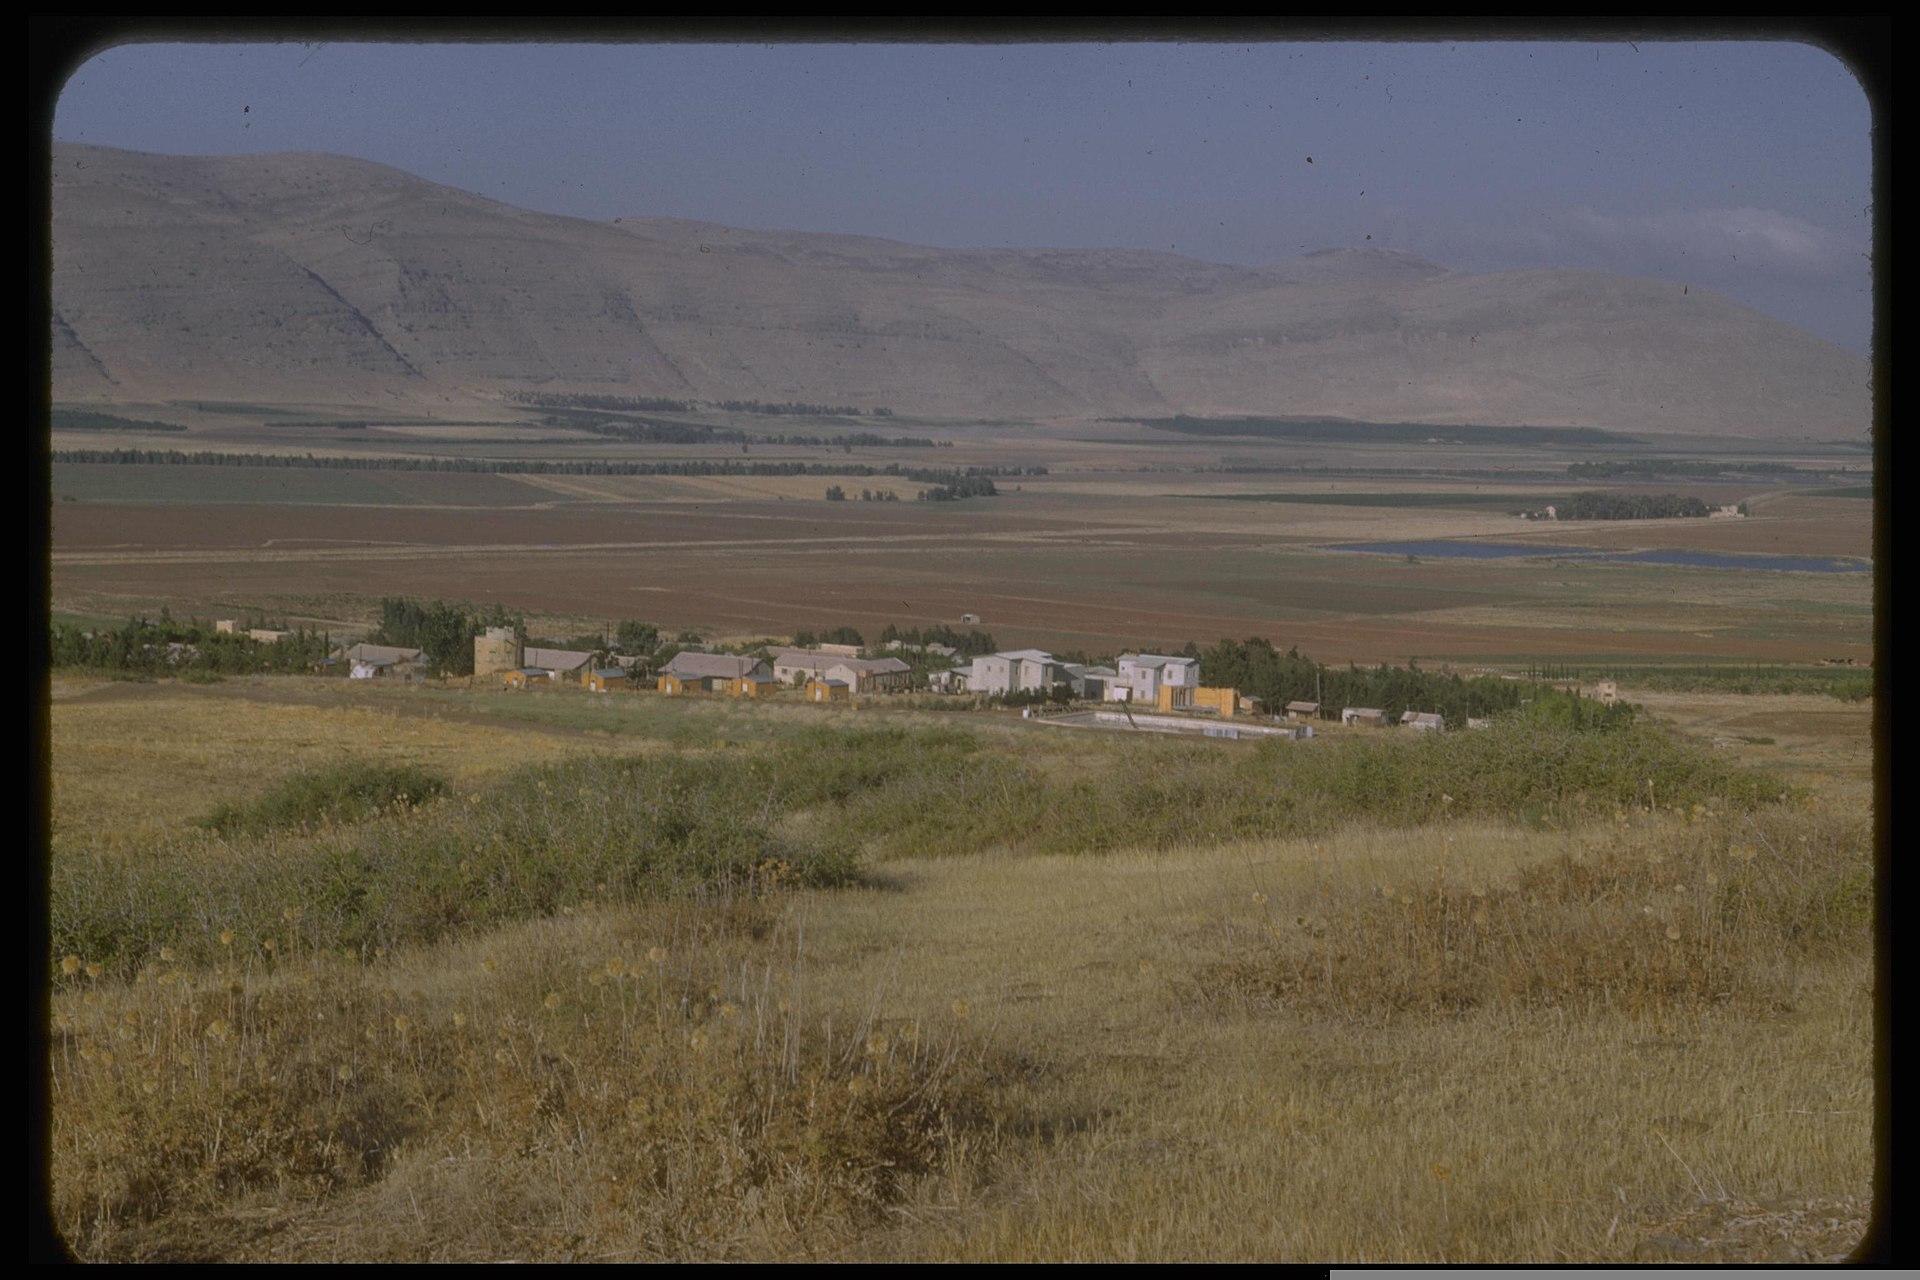 1920px-Kibbutz_Beit_Hashita1950-1